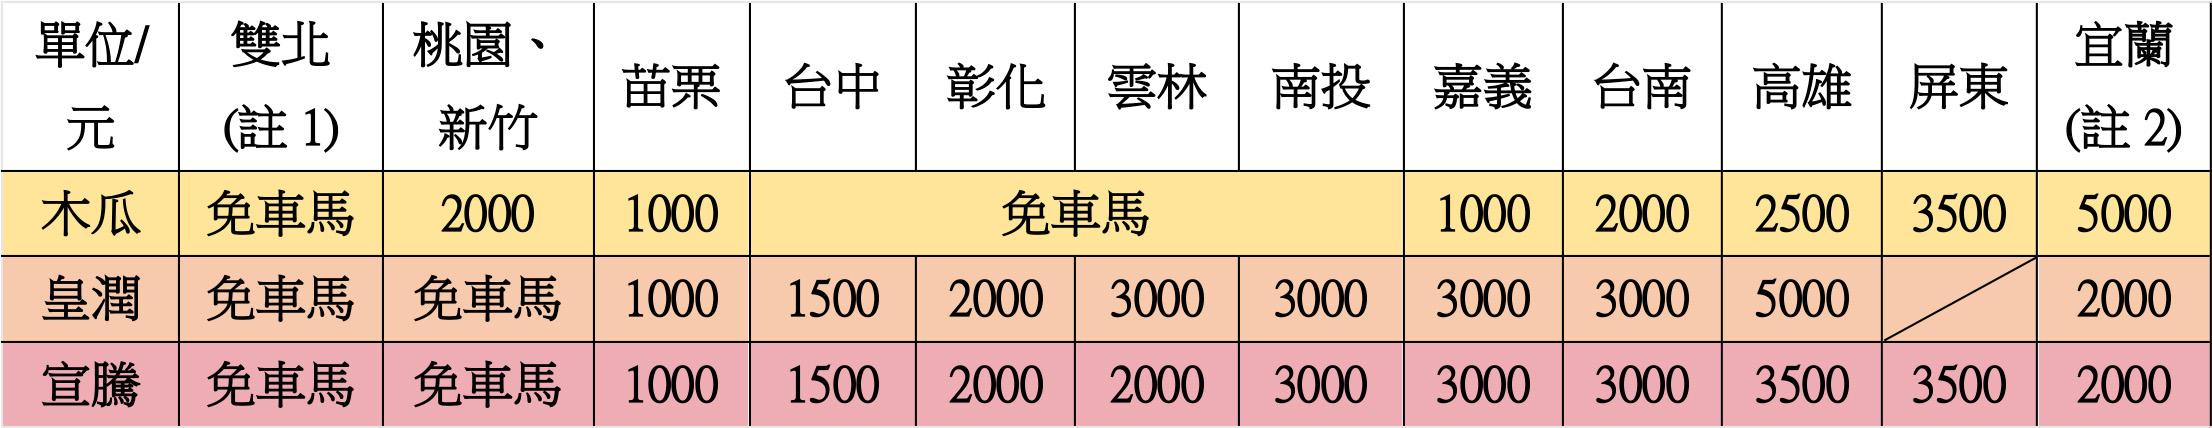 Microsoft Word - 車馬費.docx